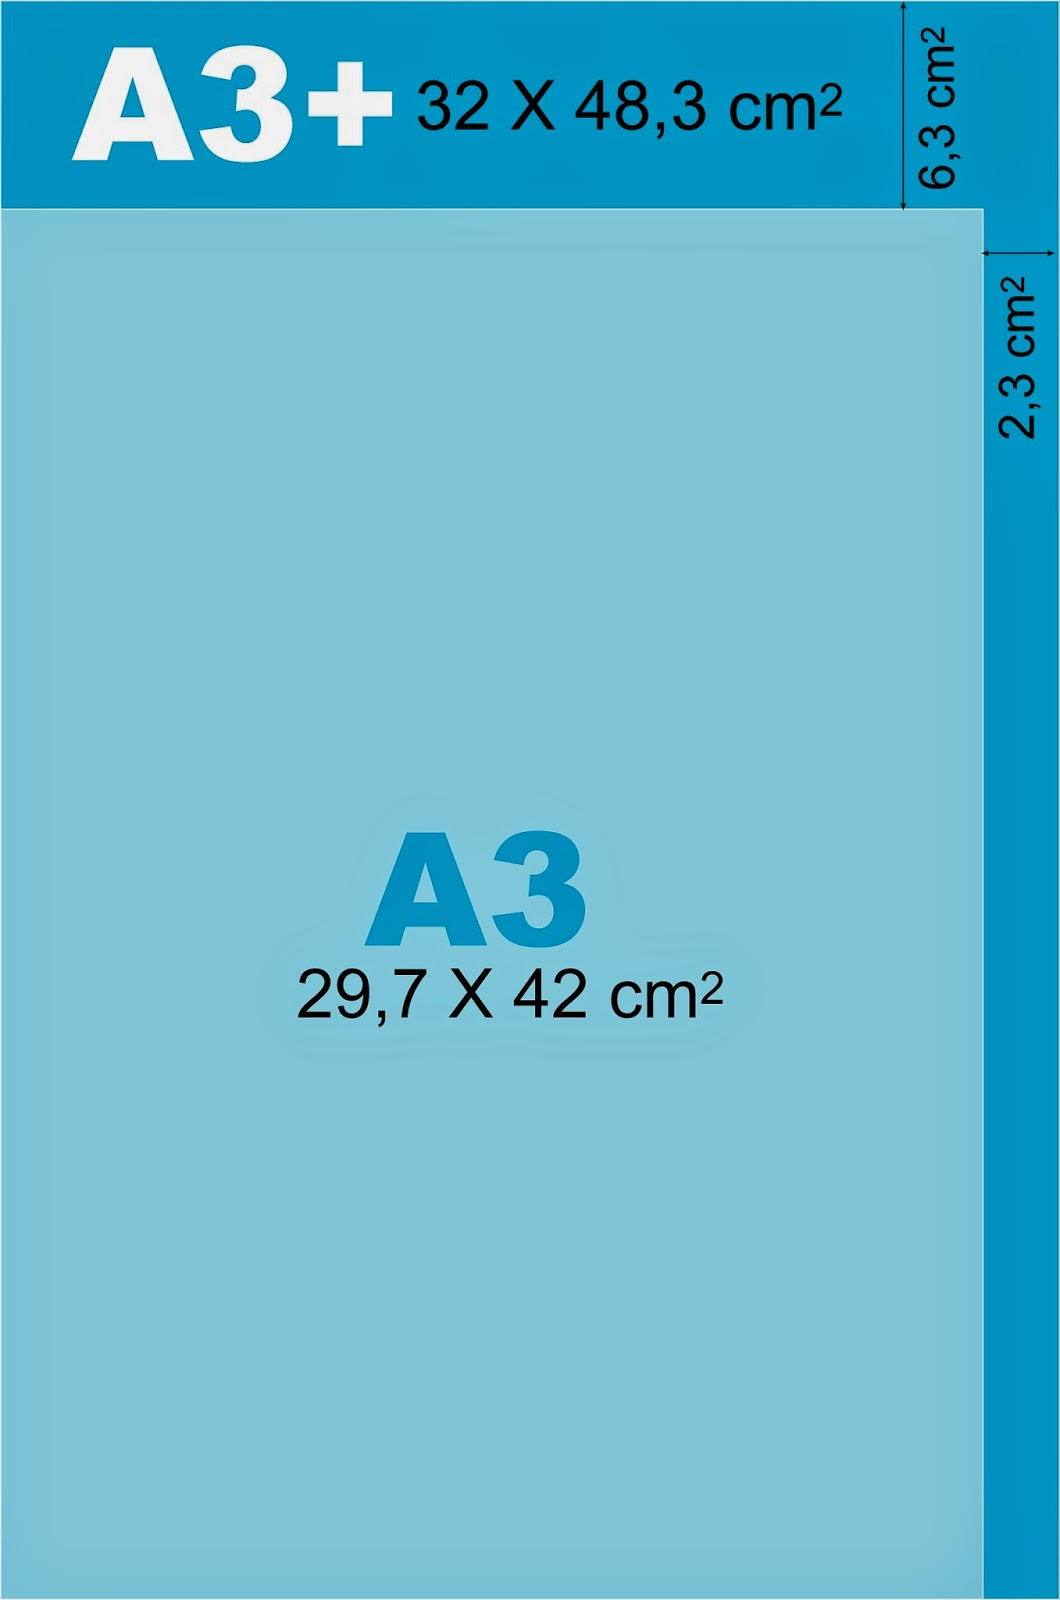 A3+ (32x48,3 cm2)